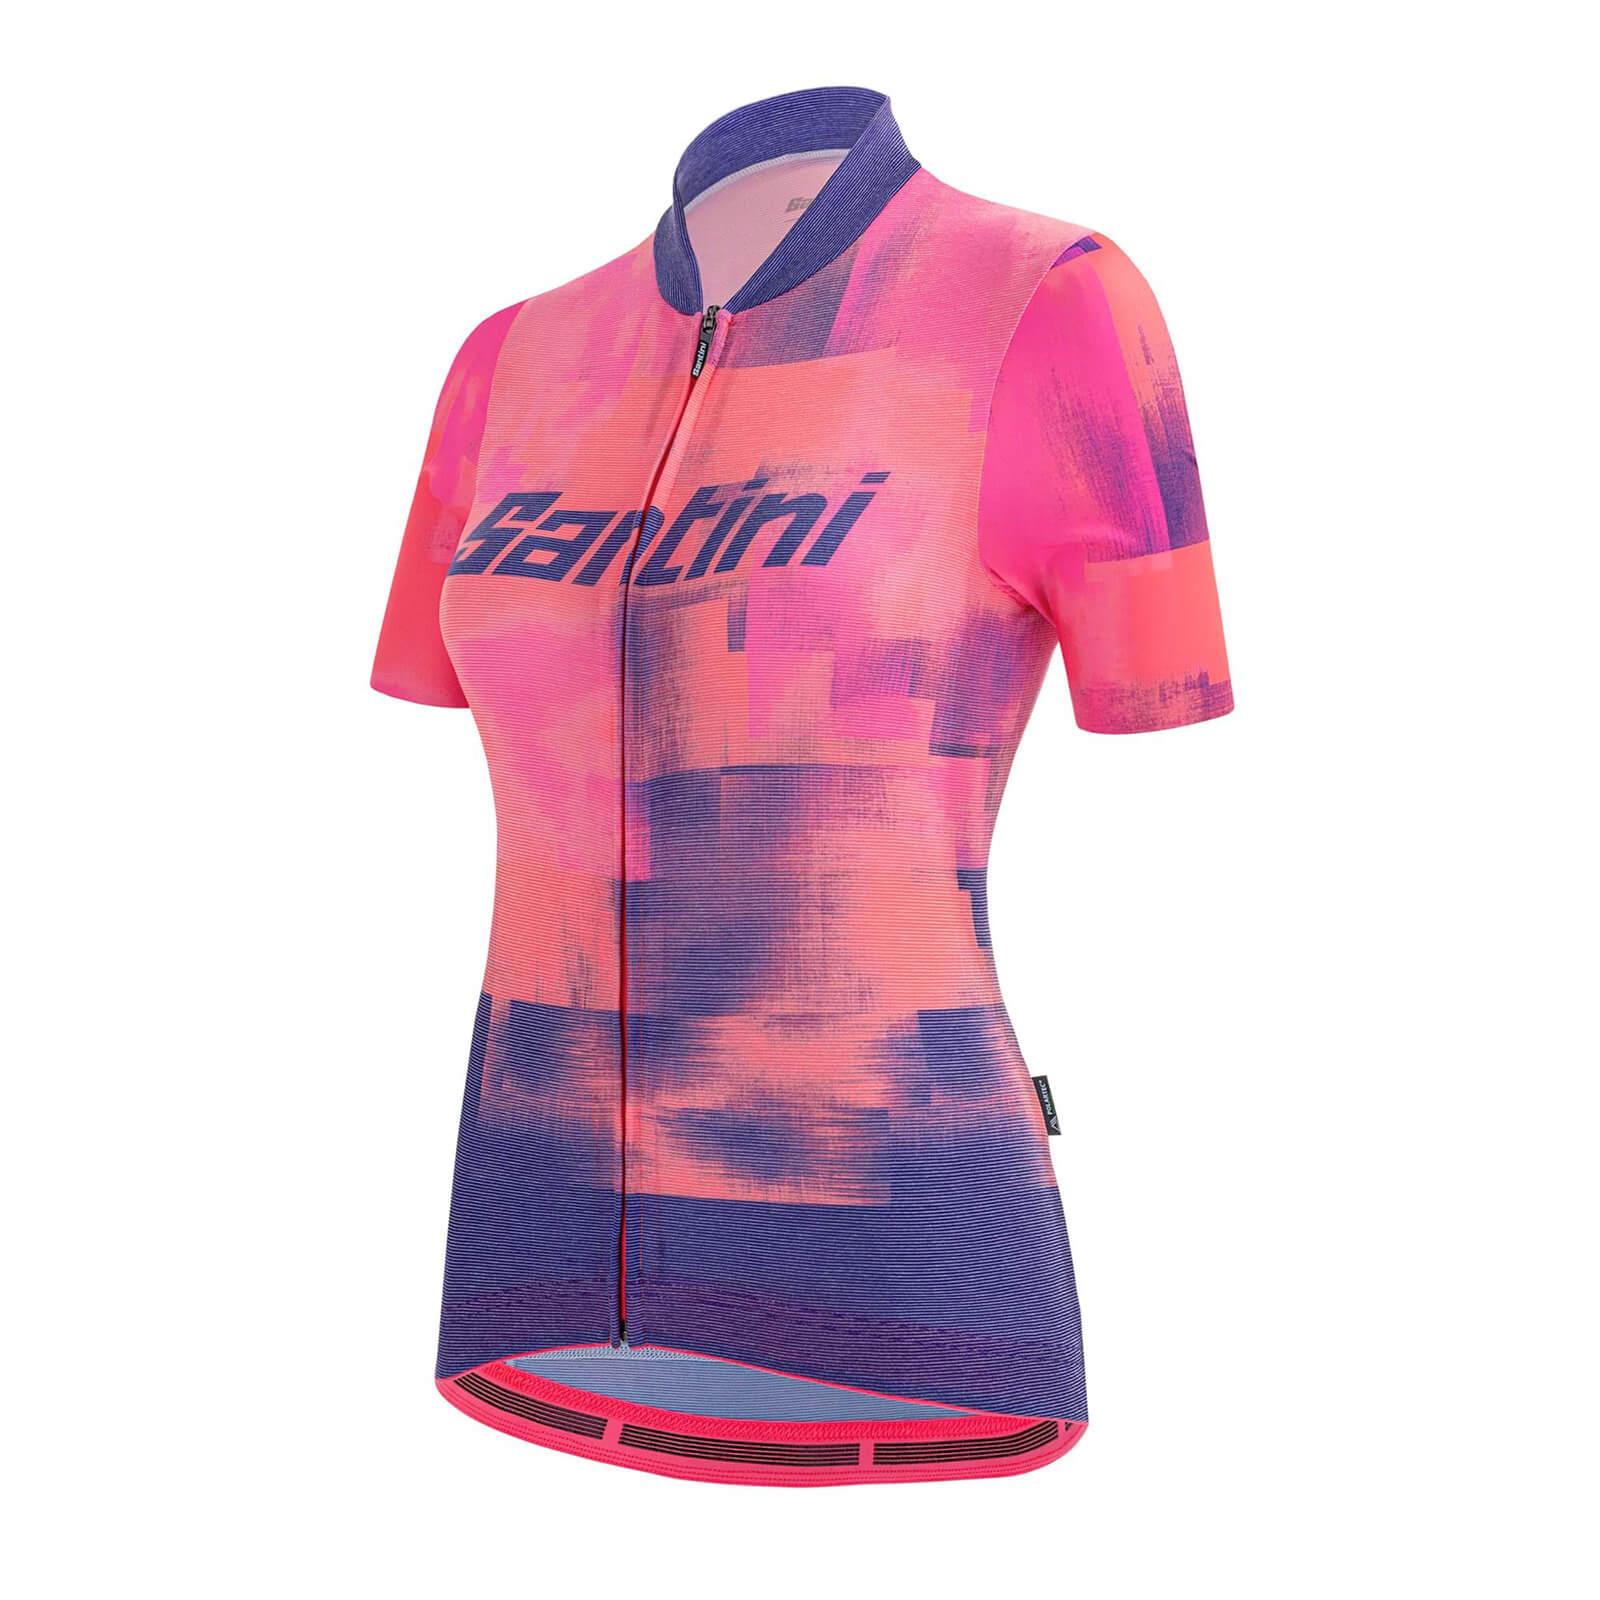 Santini Women's Indoor Forza Short Sleeve Jersey - S